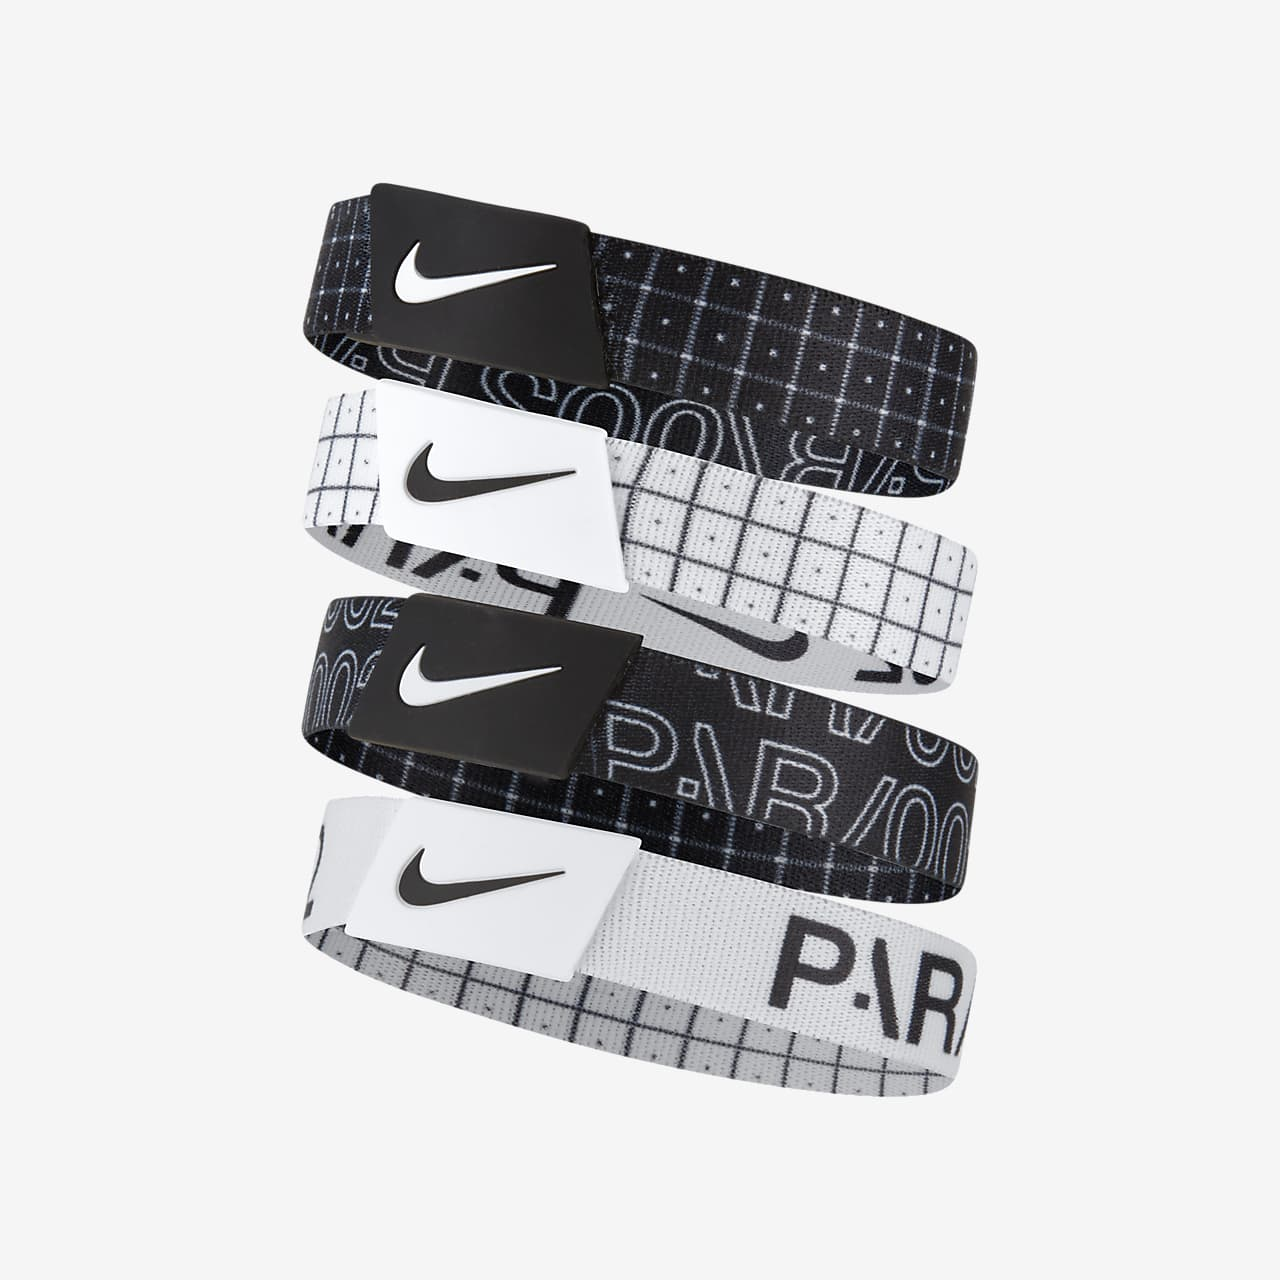 Nike House of Innovation (Paris) Baller Bands